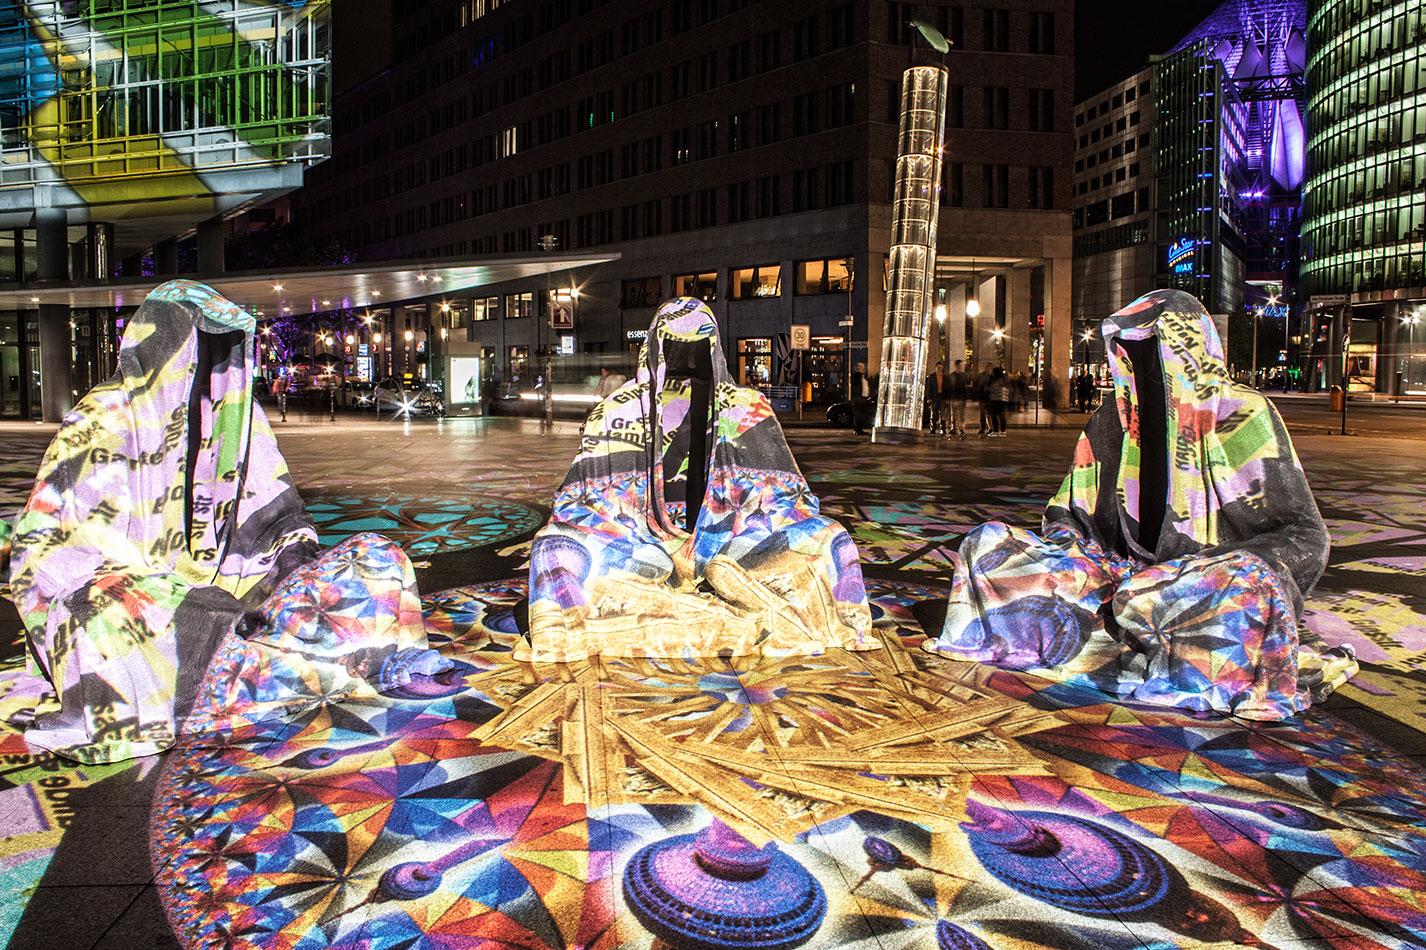 festival-of-lights-berlin-potzdamer-platz-light-art-show-exhibition-lumina-guardians-of-time-manfred-kili-kielnhofer-contemporary-arts-design-large-scale-monumental-public-sculpture-3507